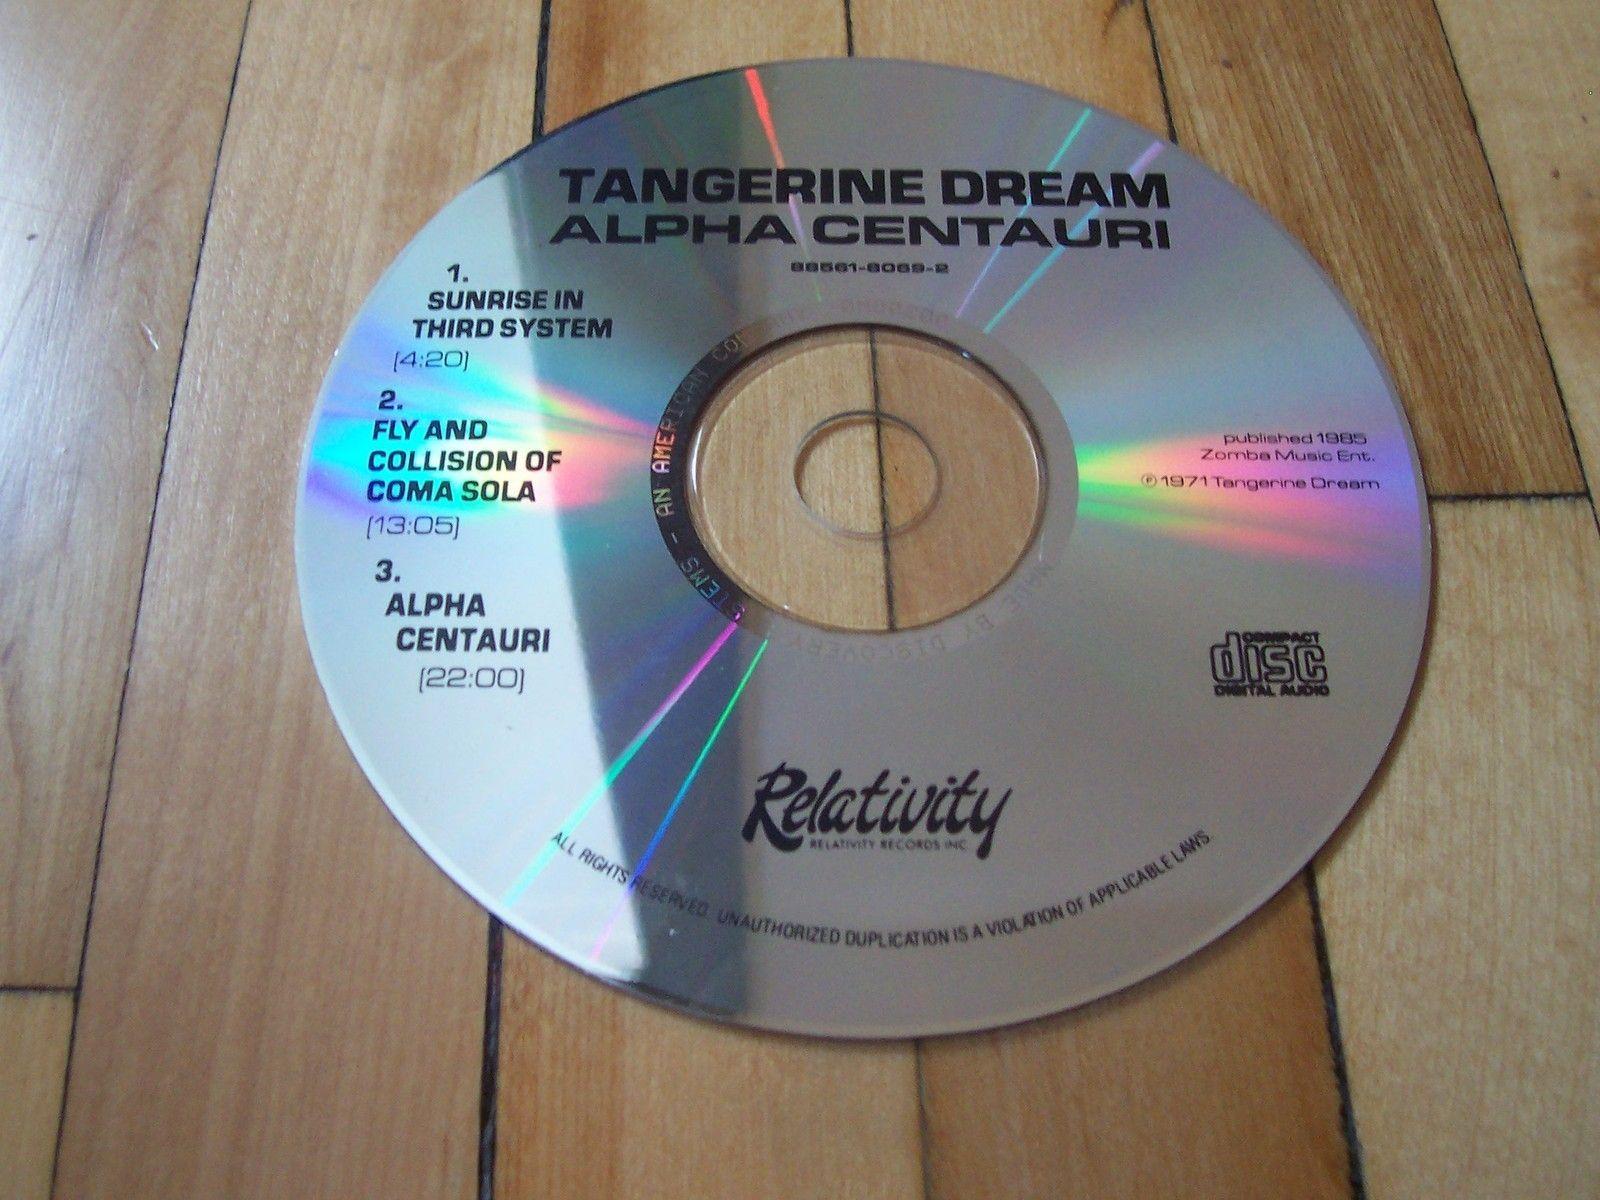 TANGERINE DREAM Alpha Centauri CD Only Missing Cover Insert & Jewel Case